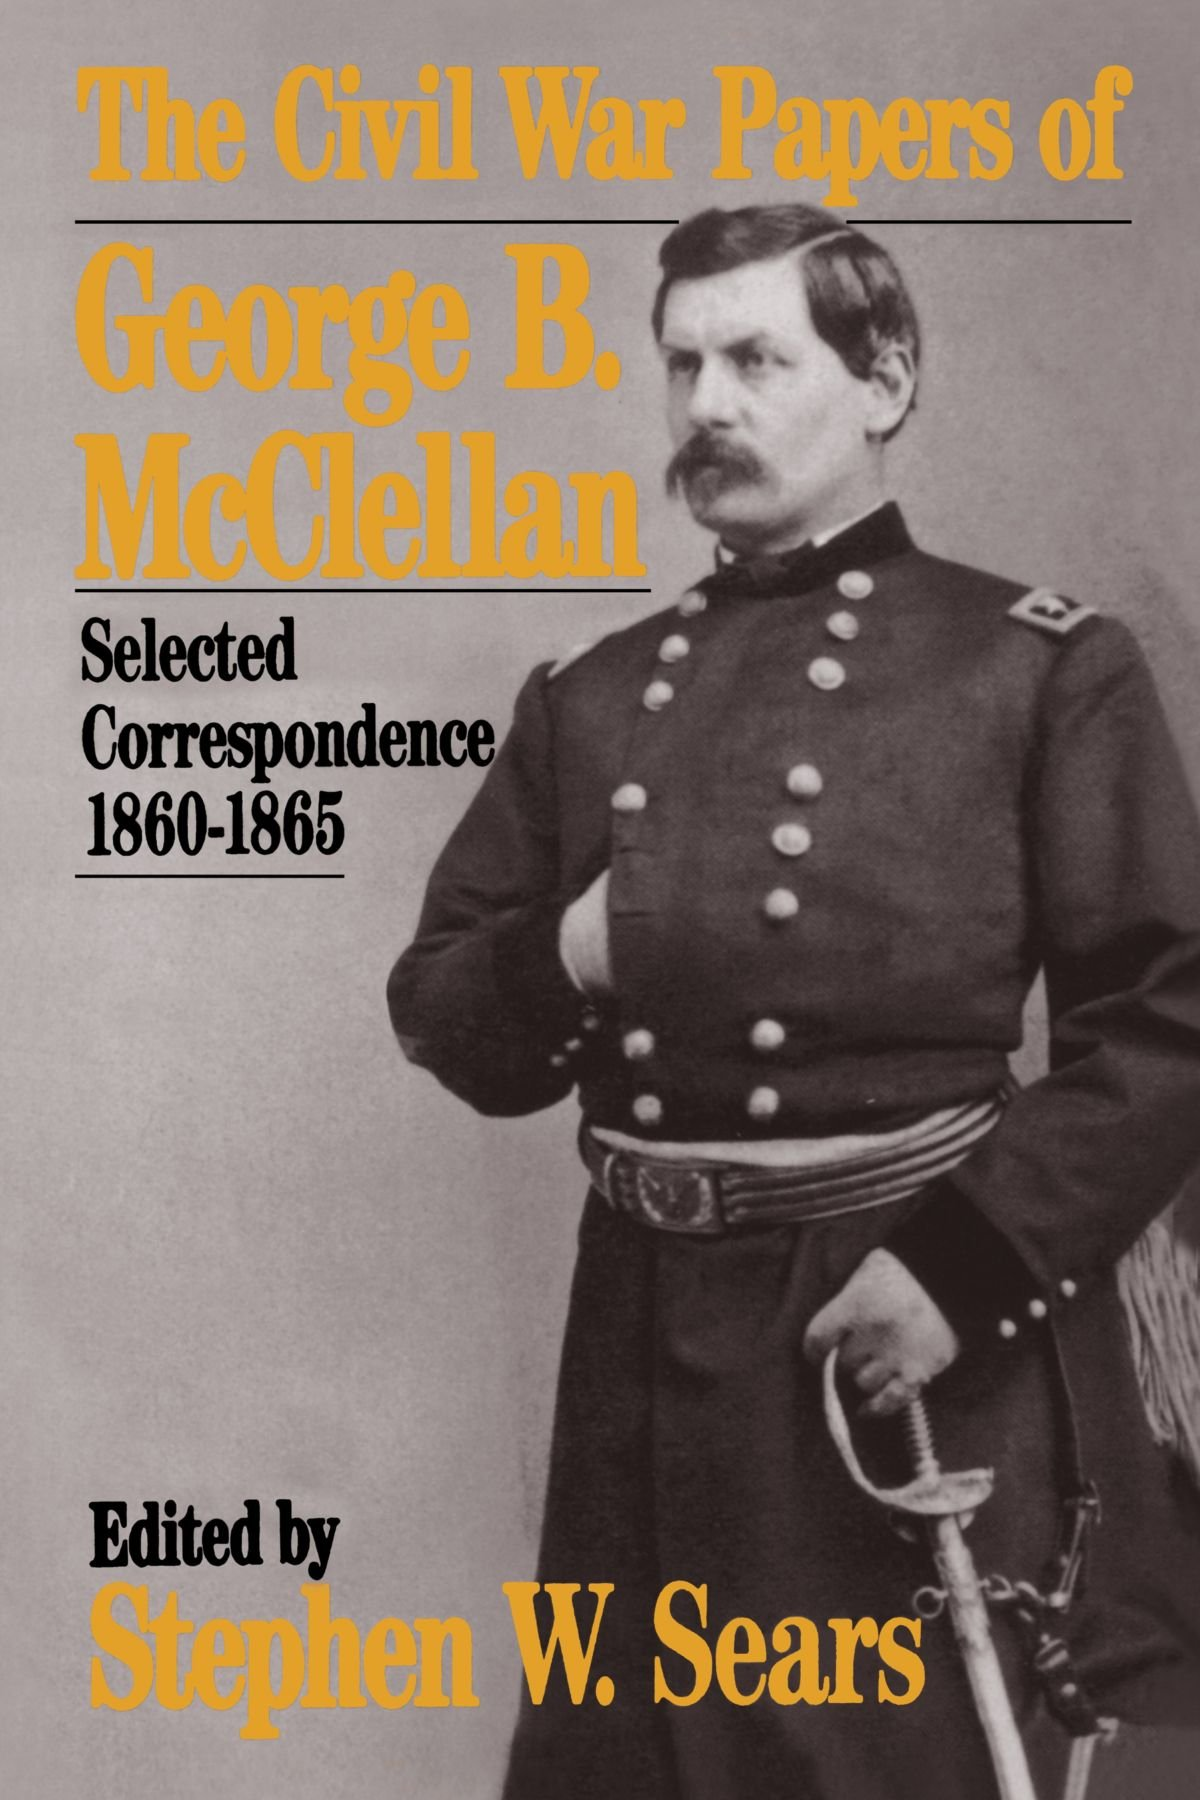 17d1111cfaae The Civil War Papers Of George B. Mcclellan  Selected Correspondence ...